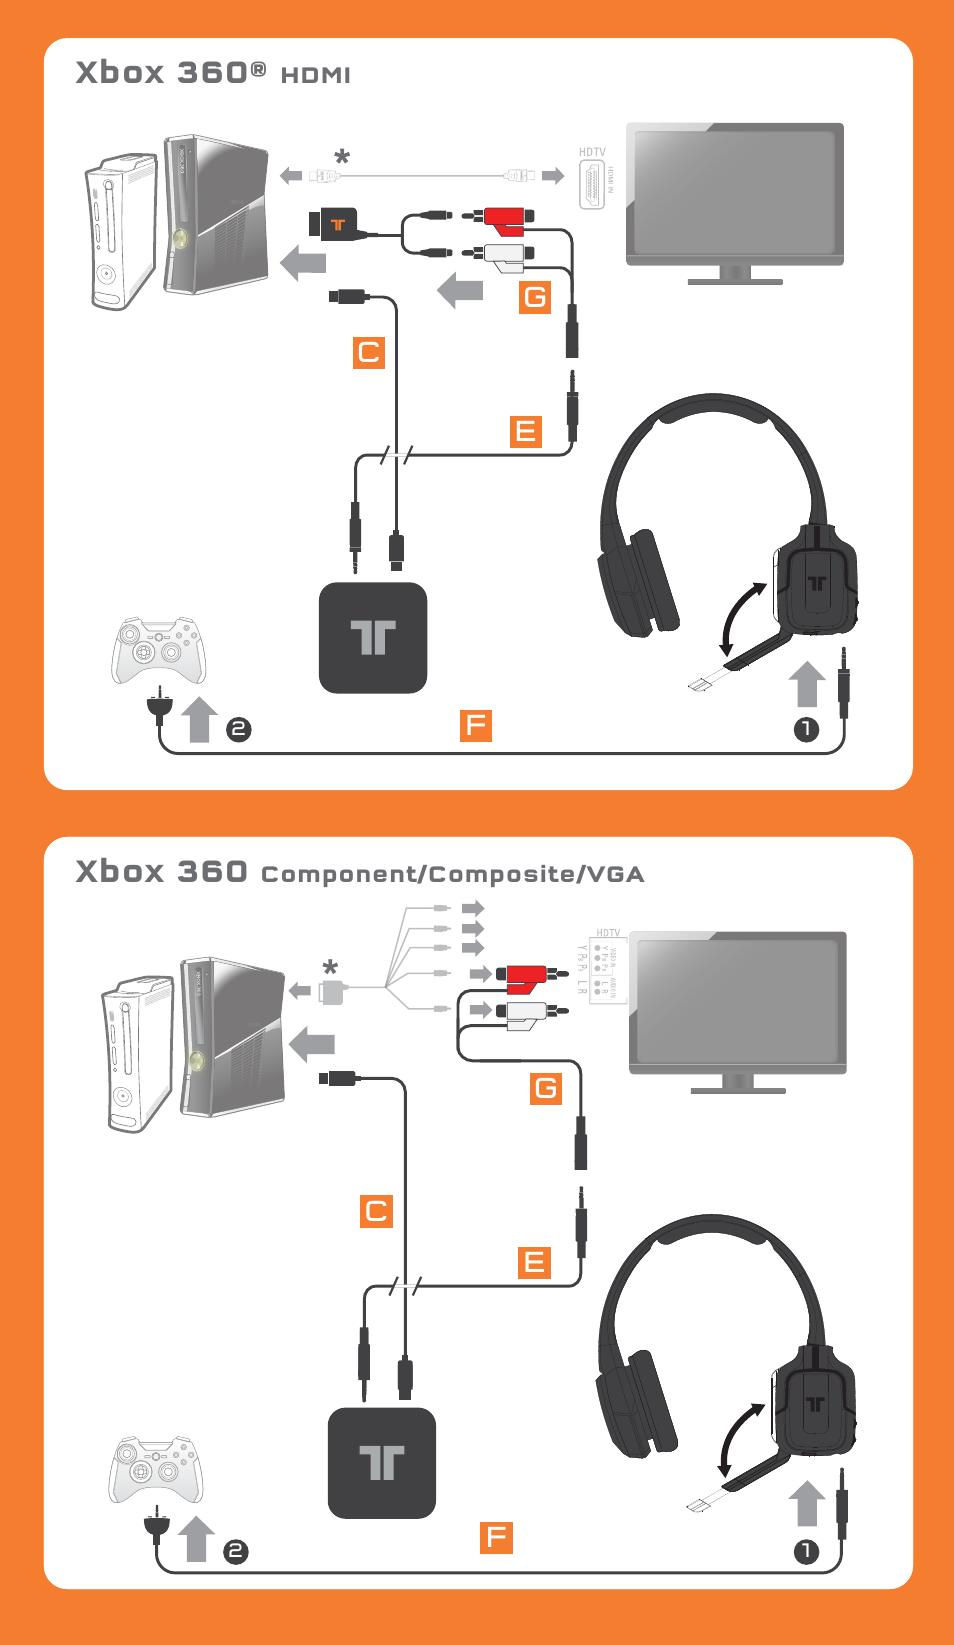 xbox 360 tritton kunai wireless stereo headset user manual page rh manualsdir com Xbox 360 Wireless Headset Sale Xbox 360 Wireless Headset with Bluetooth